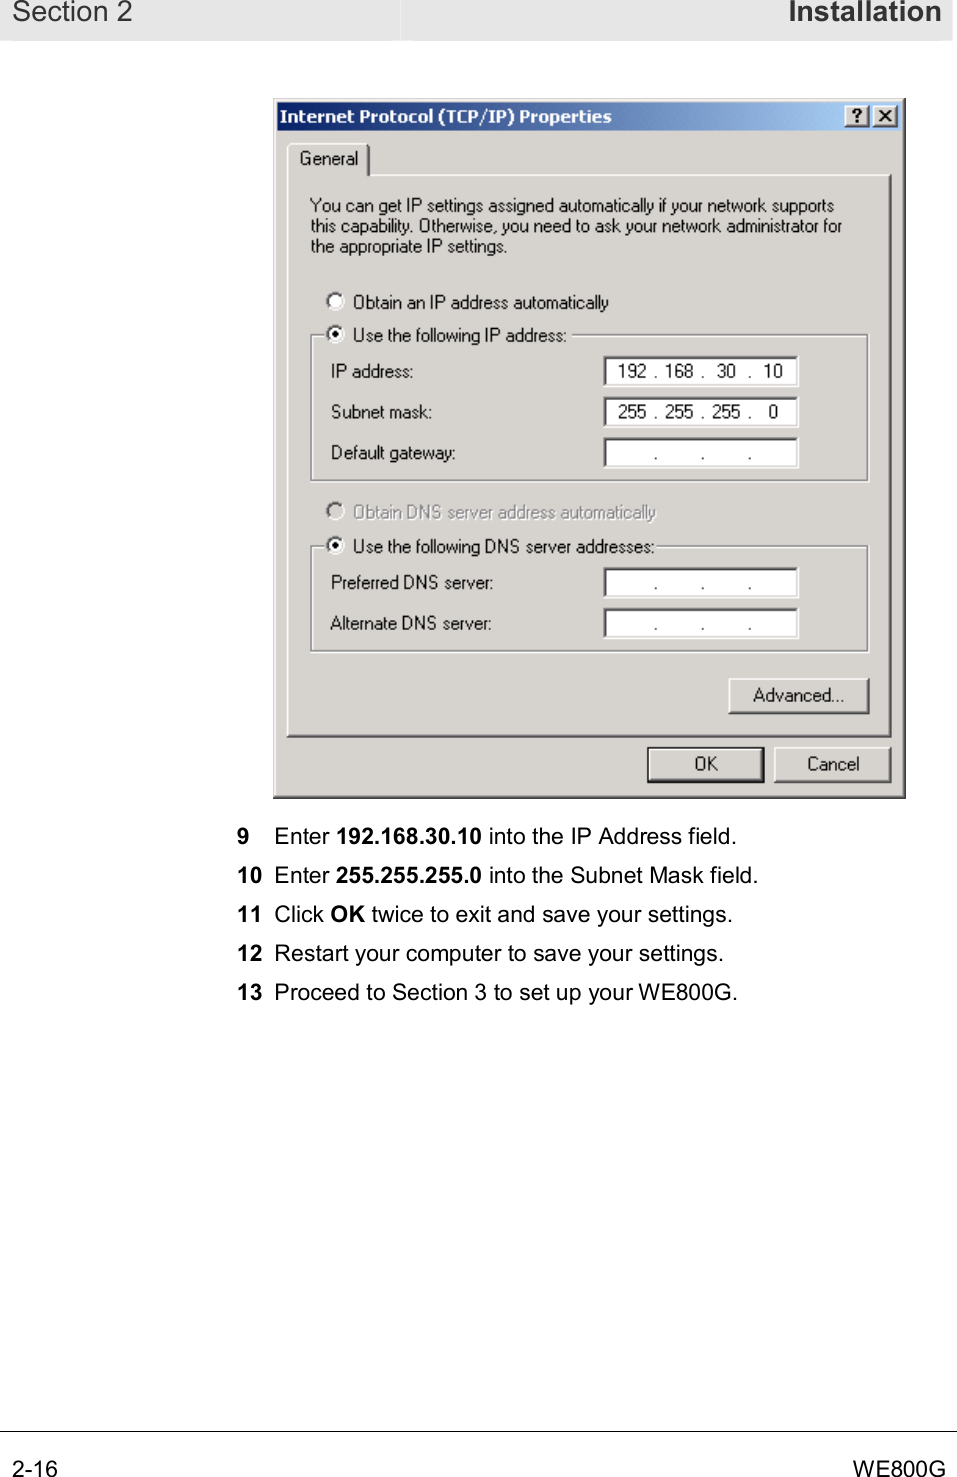 motorola we800g software